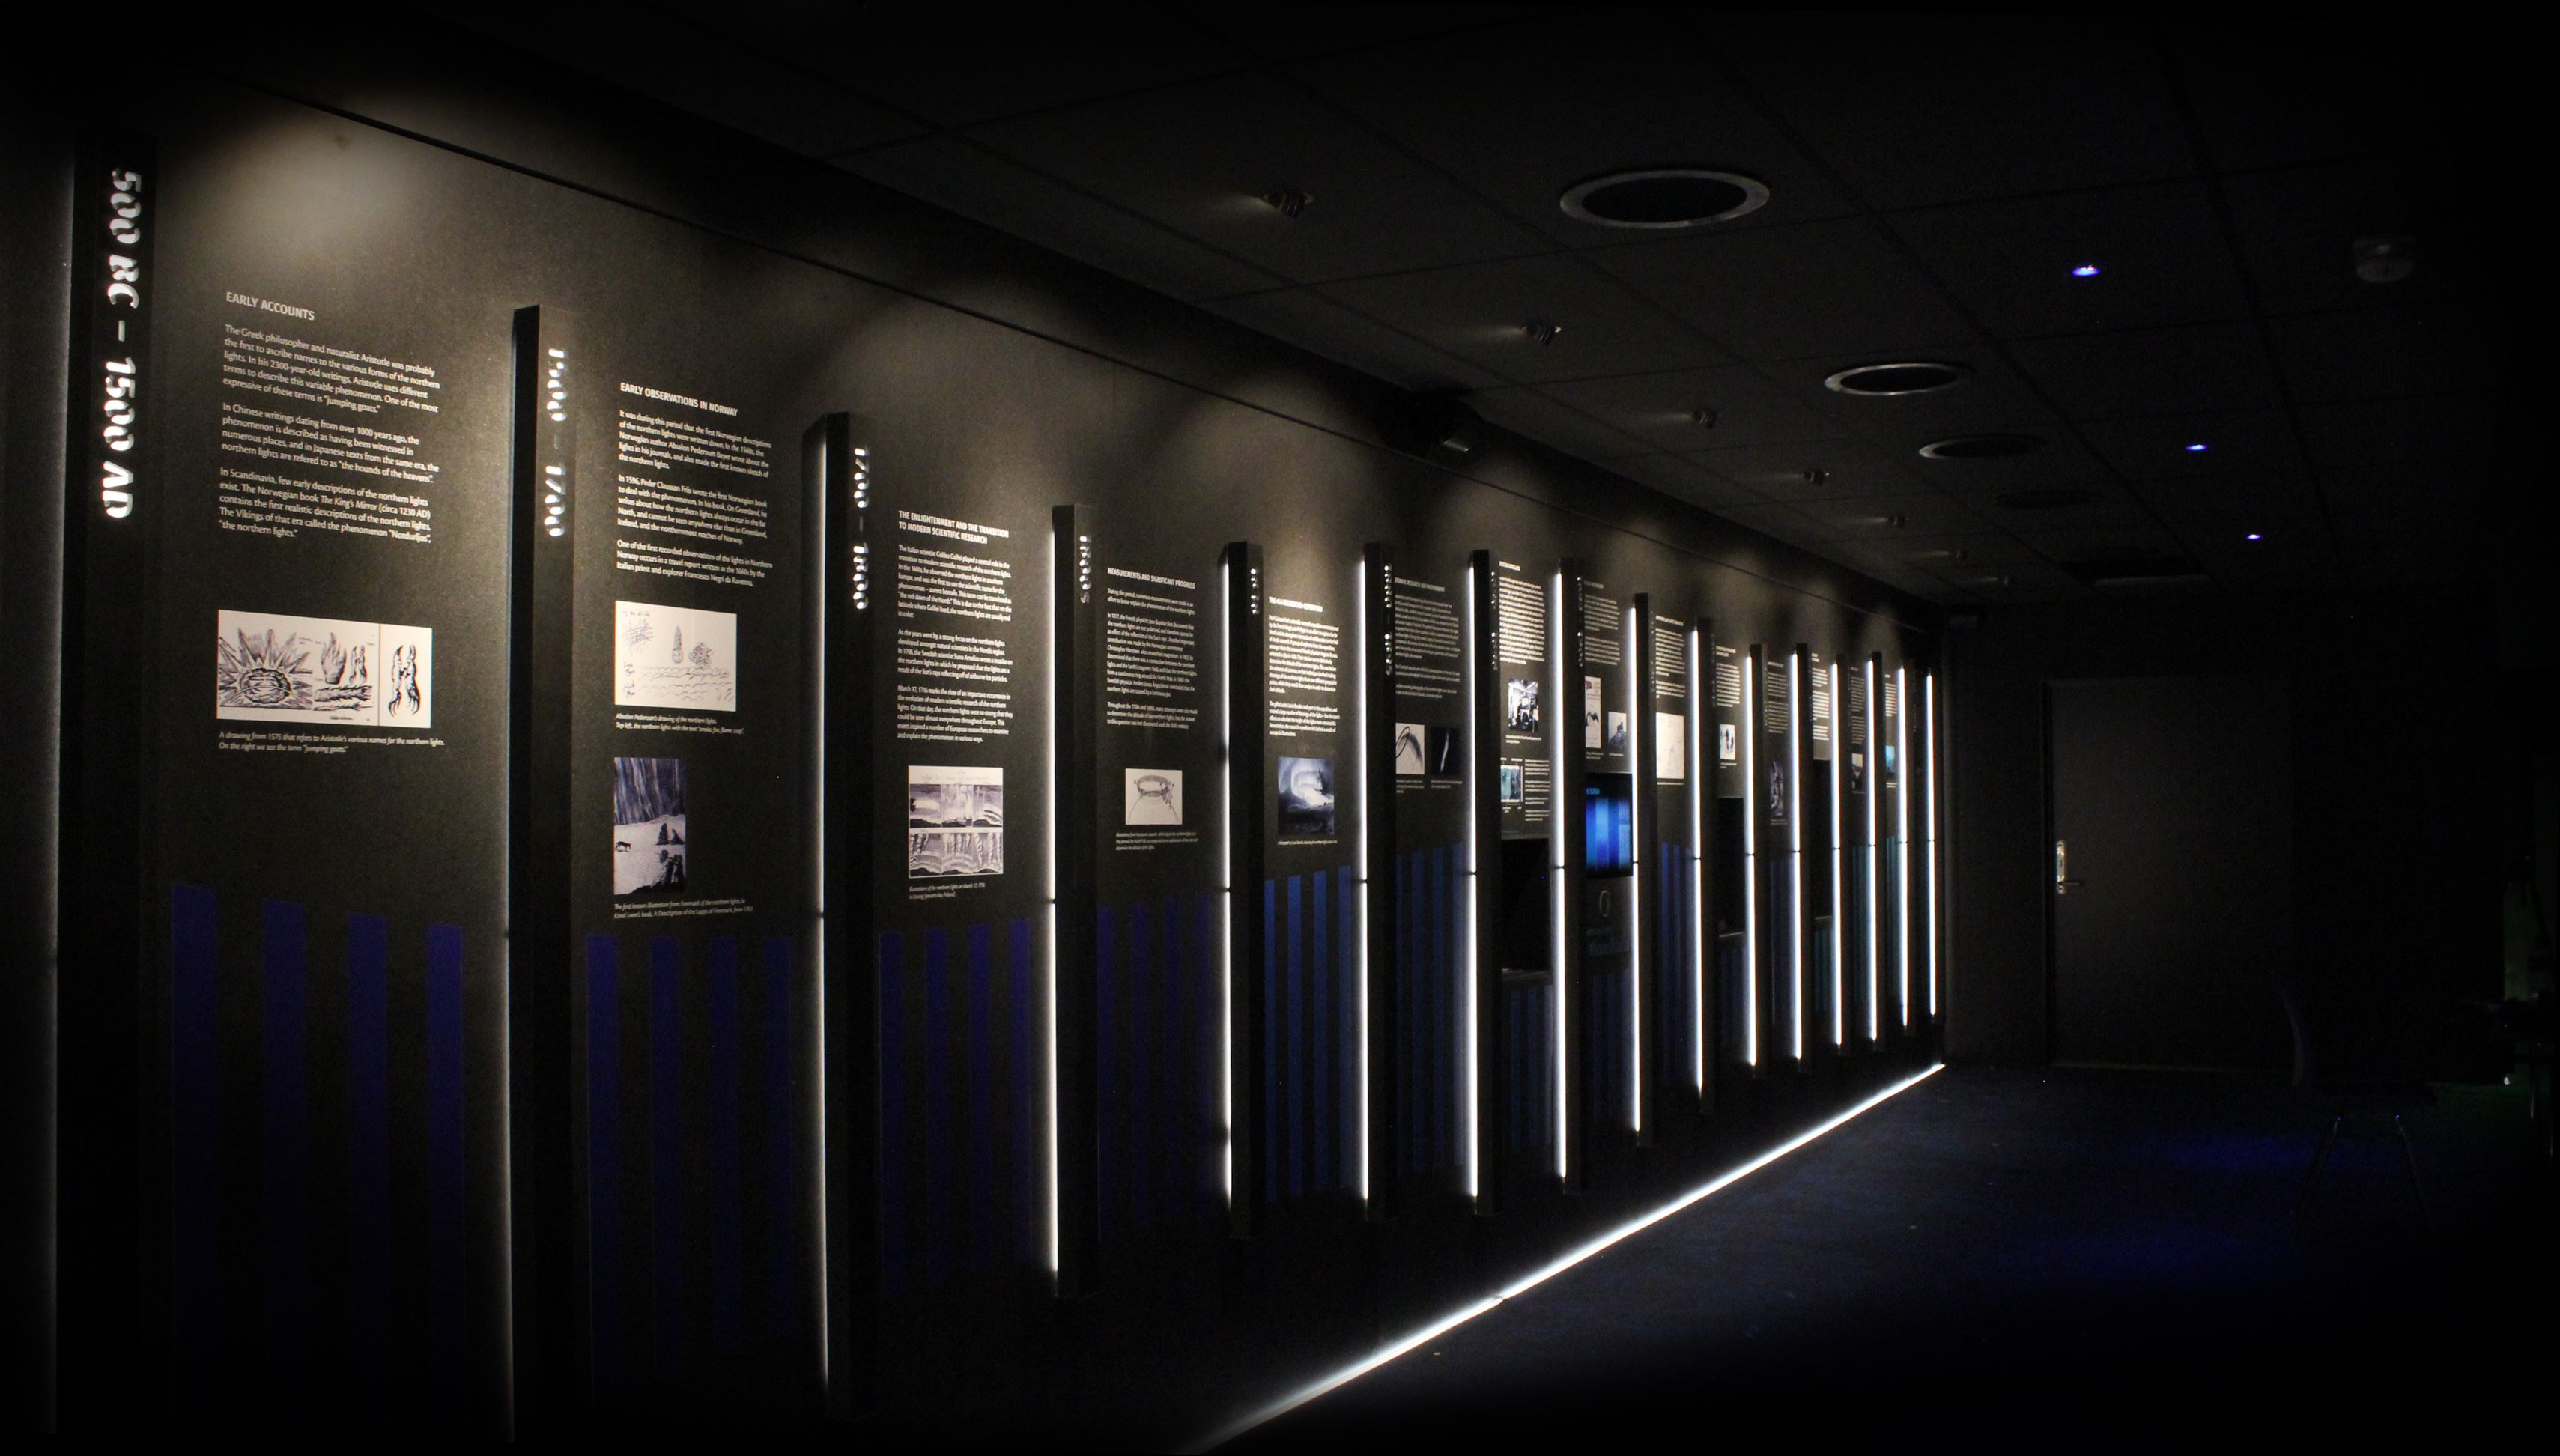 LN,  © BorealisAlta, BorealisAlta - en interaktiv nordlysopplevelse